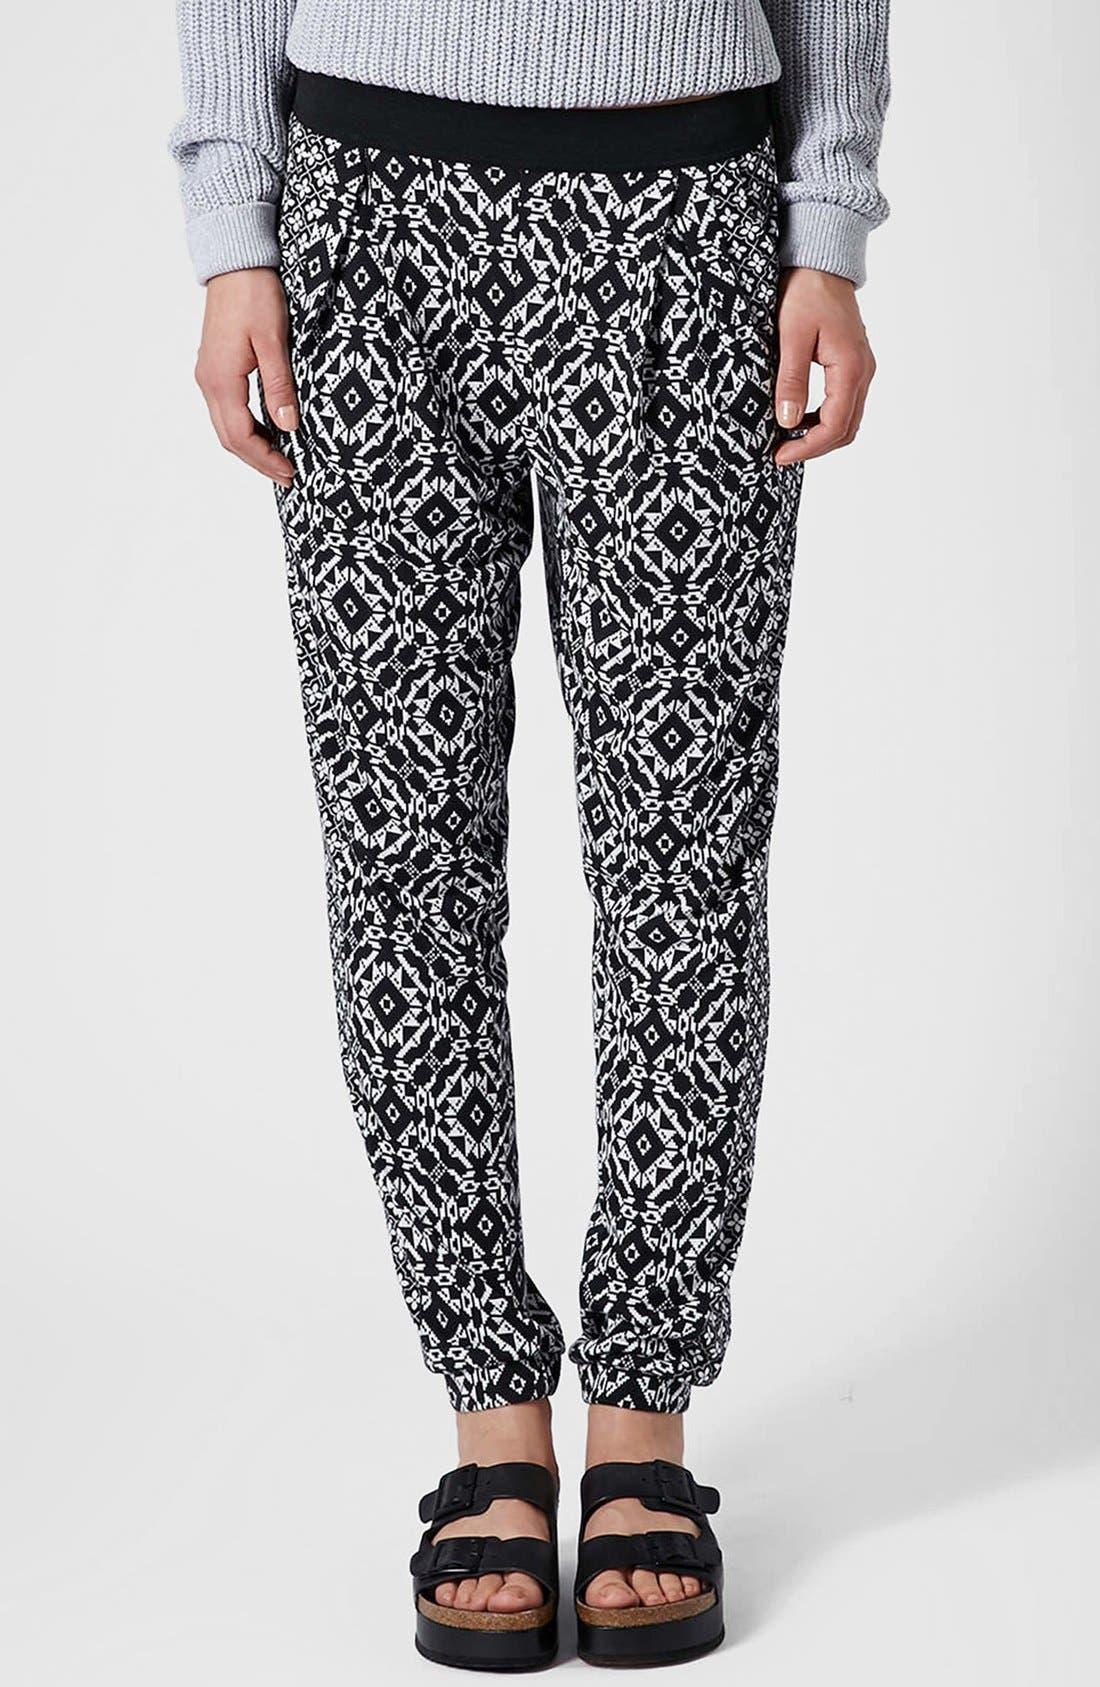 Alternate Image 1 Selected - Topshop Mixed Print Tapered Pants (Regular & Petite)